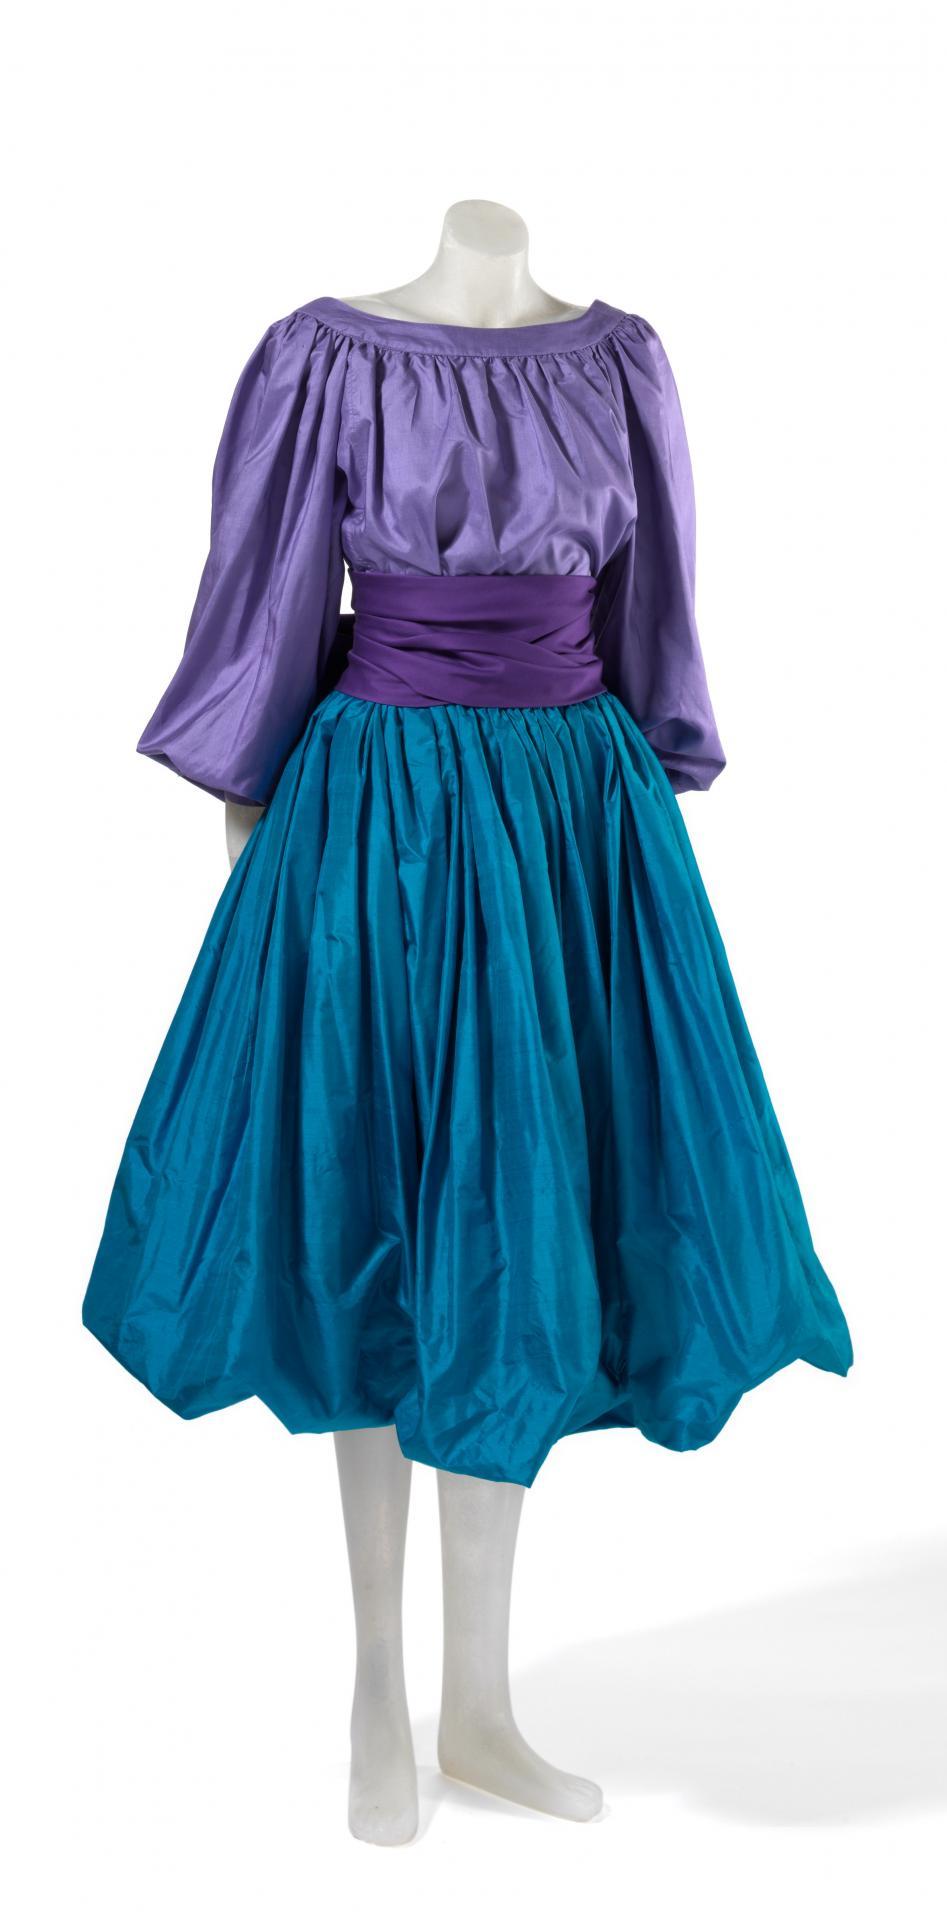 b57021ff76f Blouse, skirt and sash | YVES SAINT LAURENT RIVE GAUCHE, Paris ...